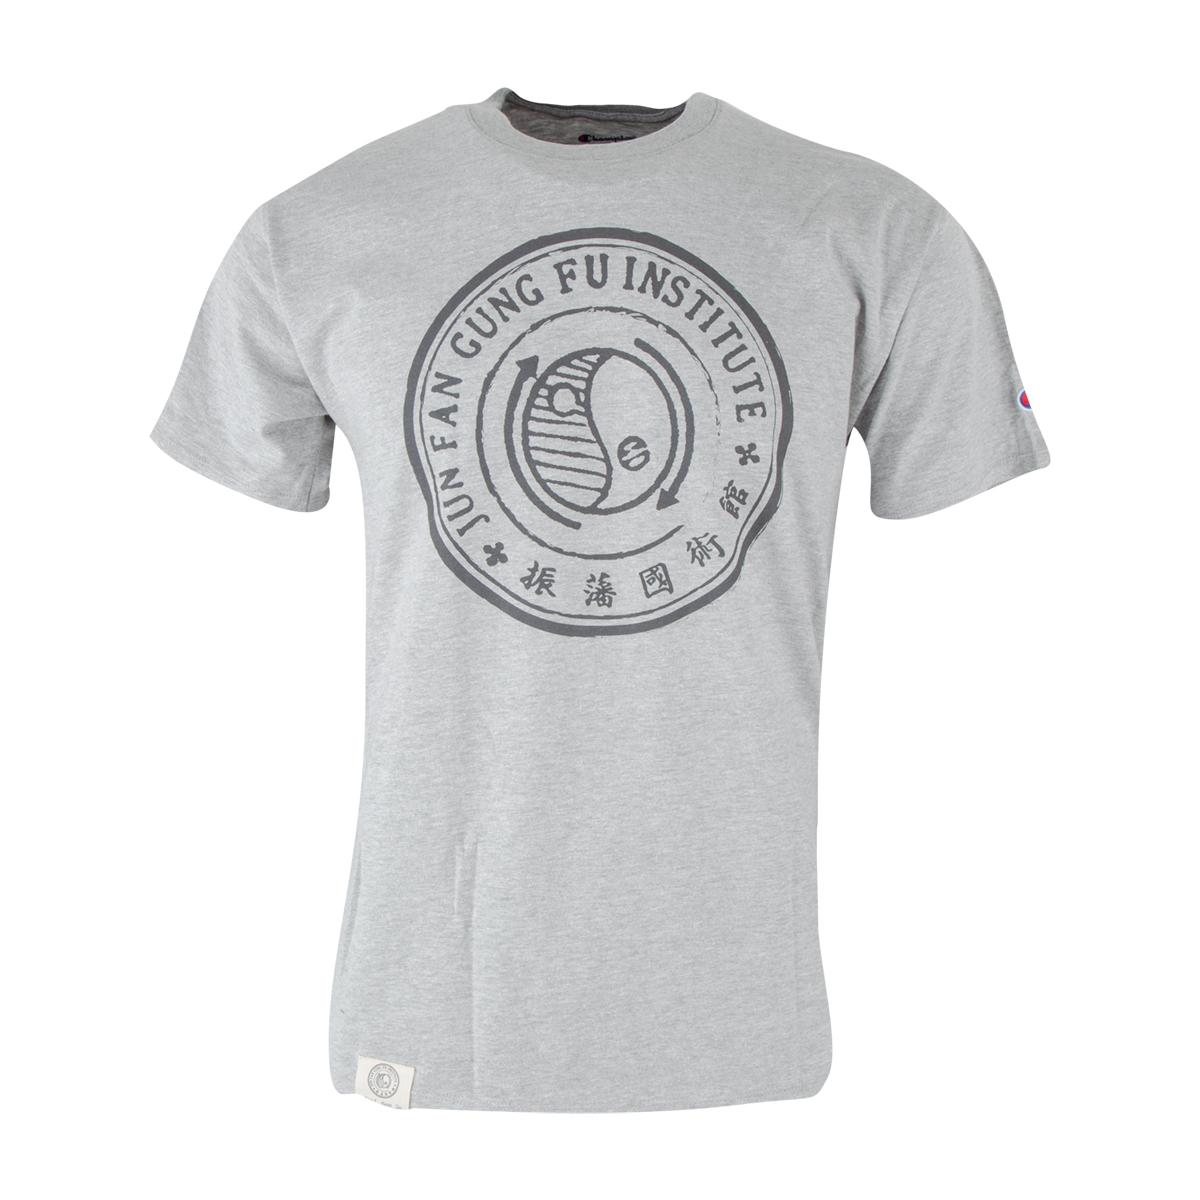 JKD Origins Simplicity Champion T-shirt